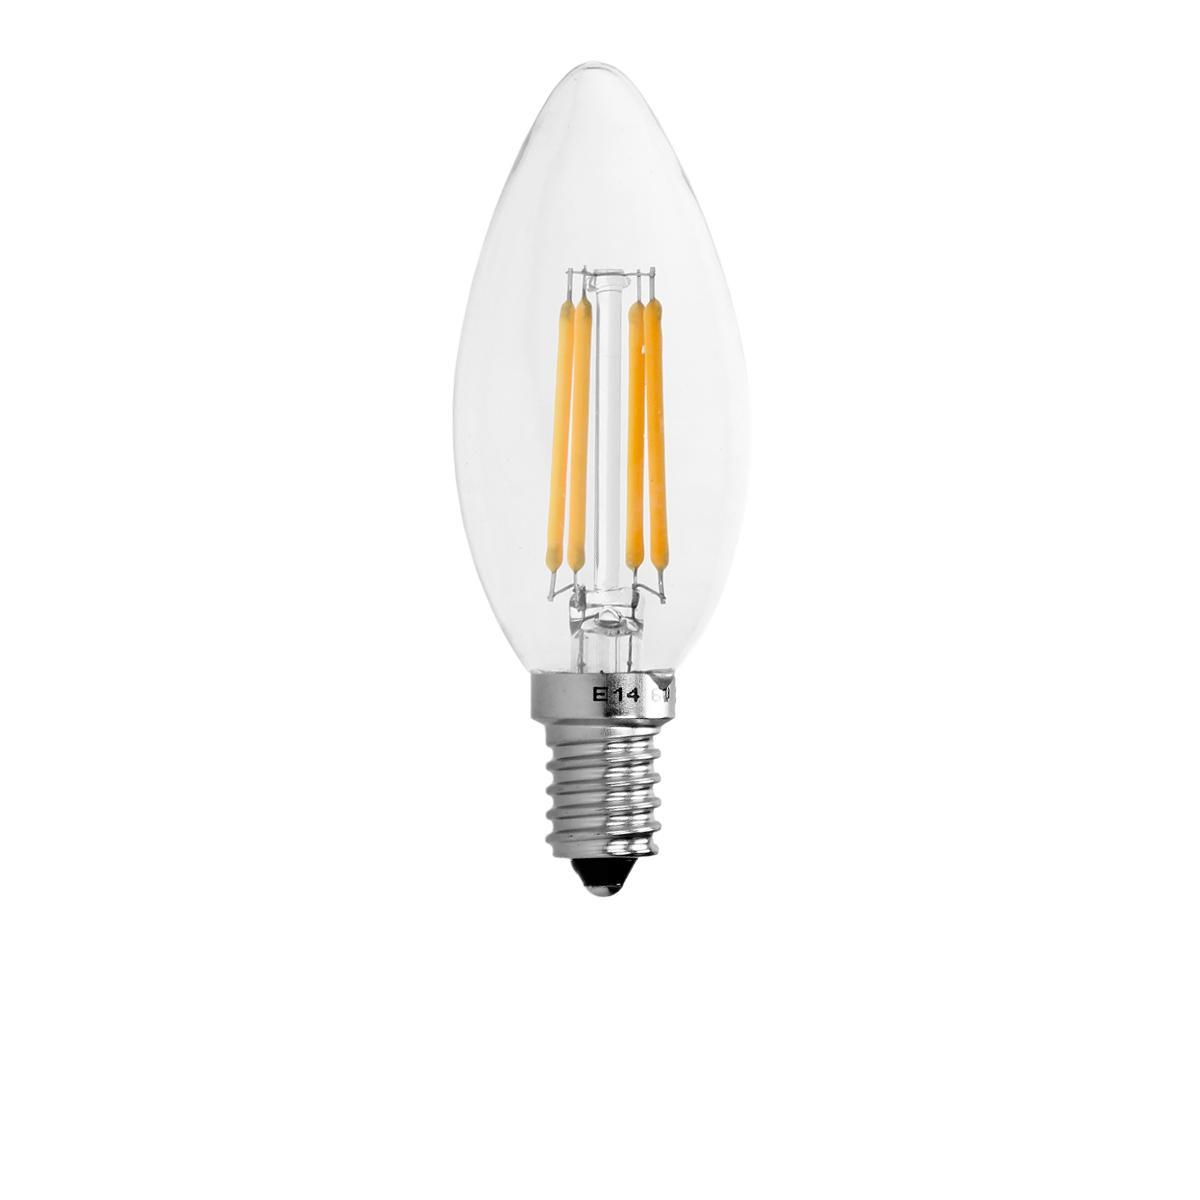 Ecd Germany ECD Germany 4 x LED Filament de la bougie E14 4W 414 Lumens 120 ° Angle de courant alternatif 220-240 V reste caché et r